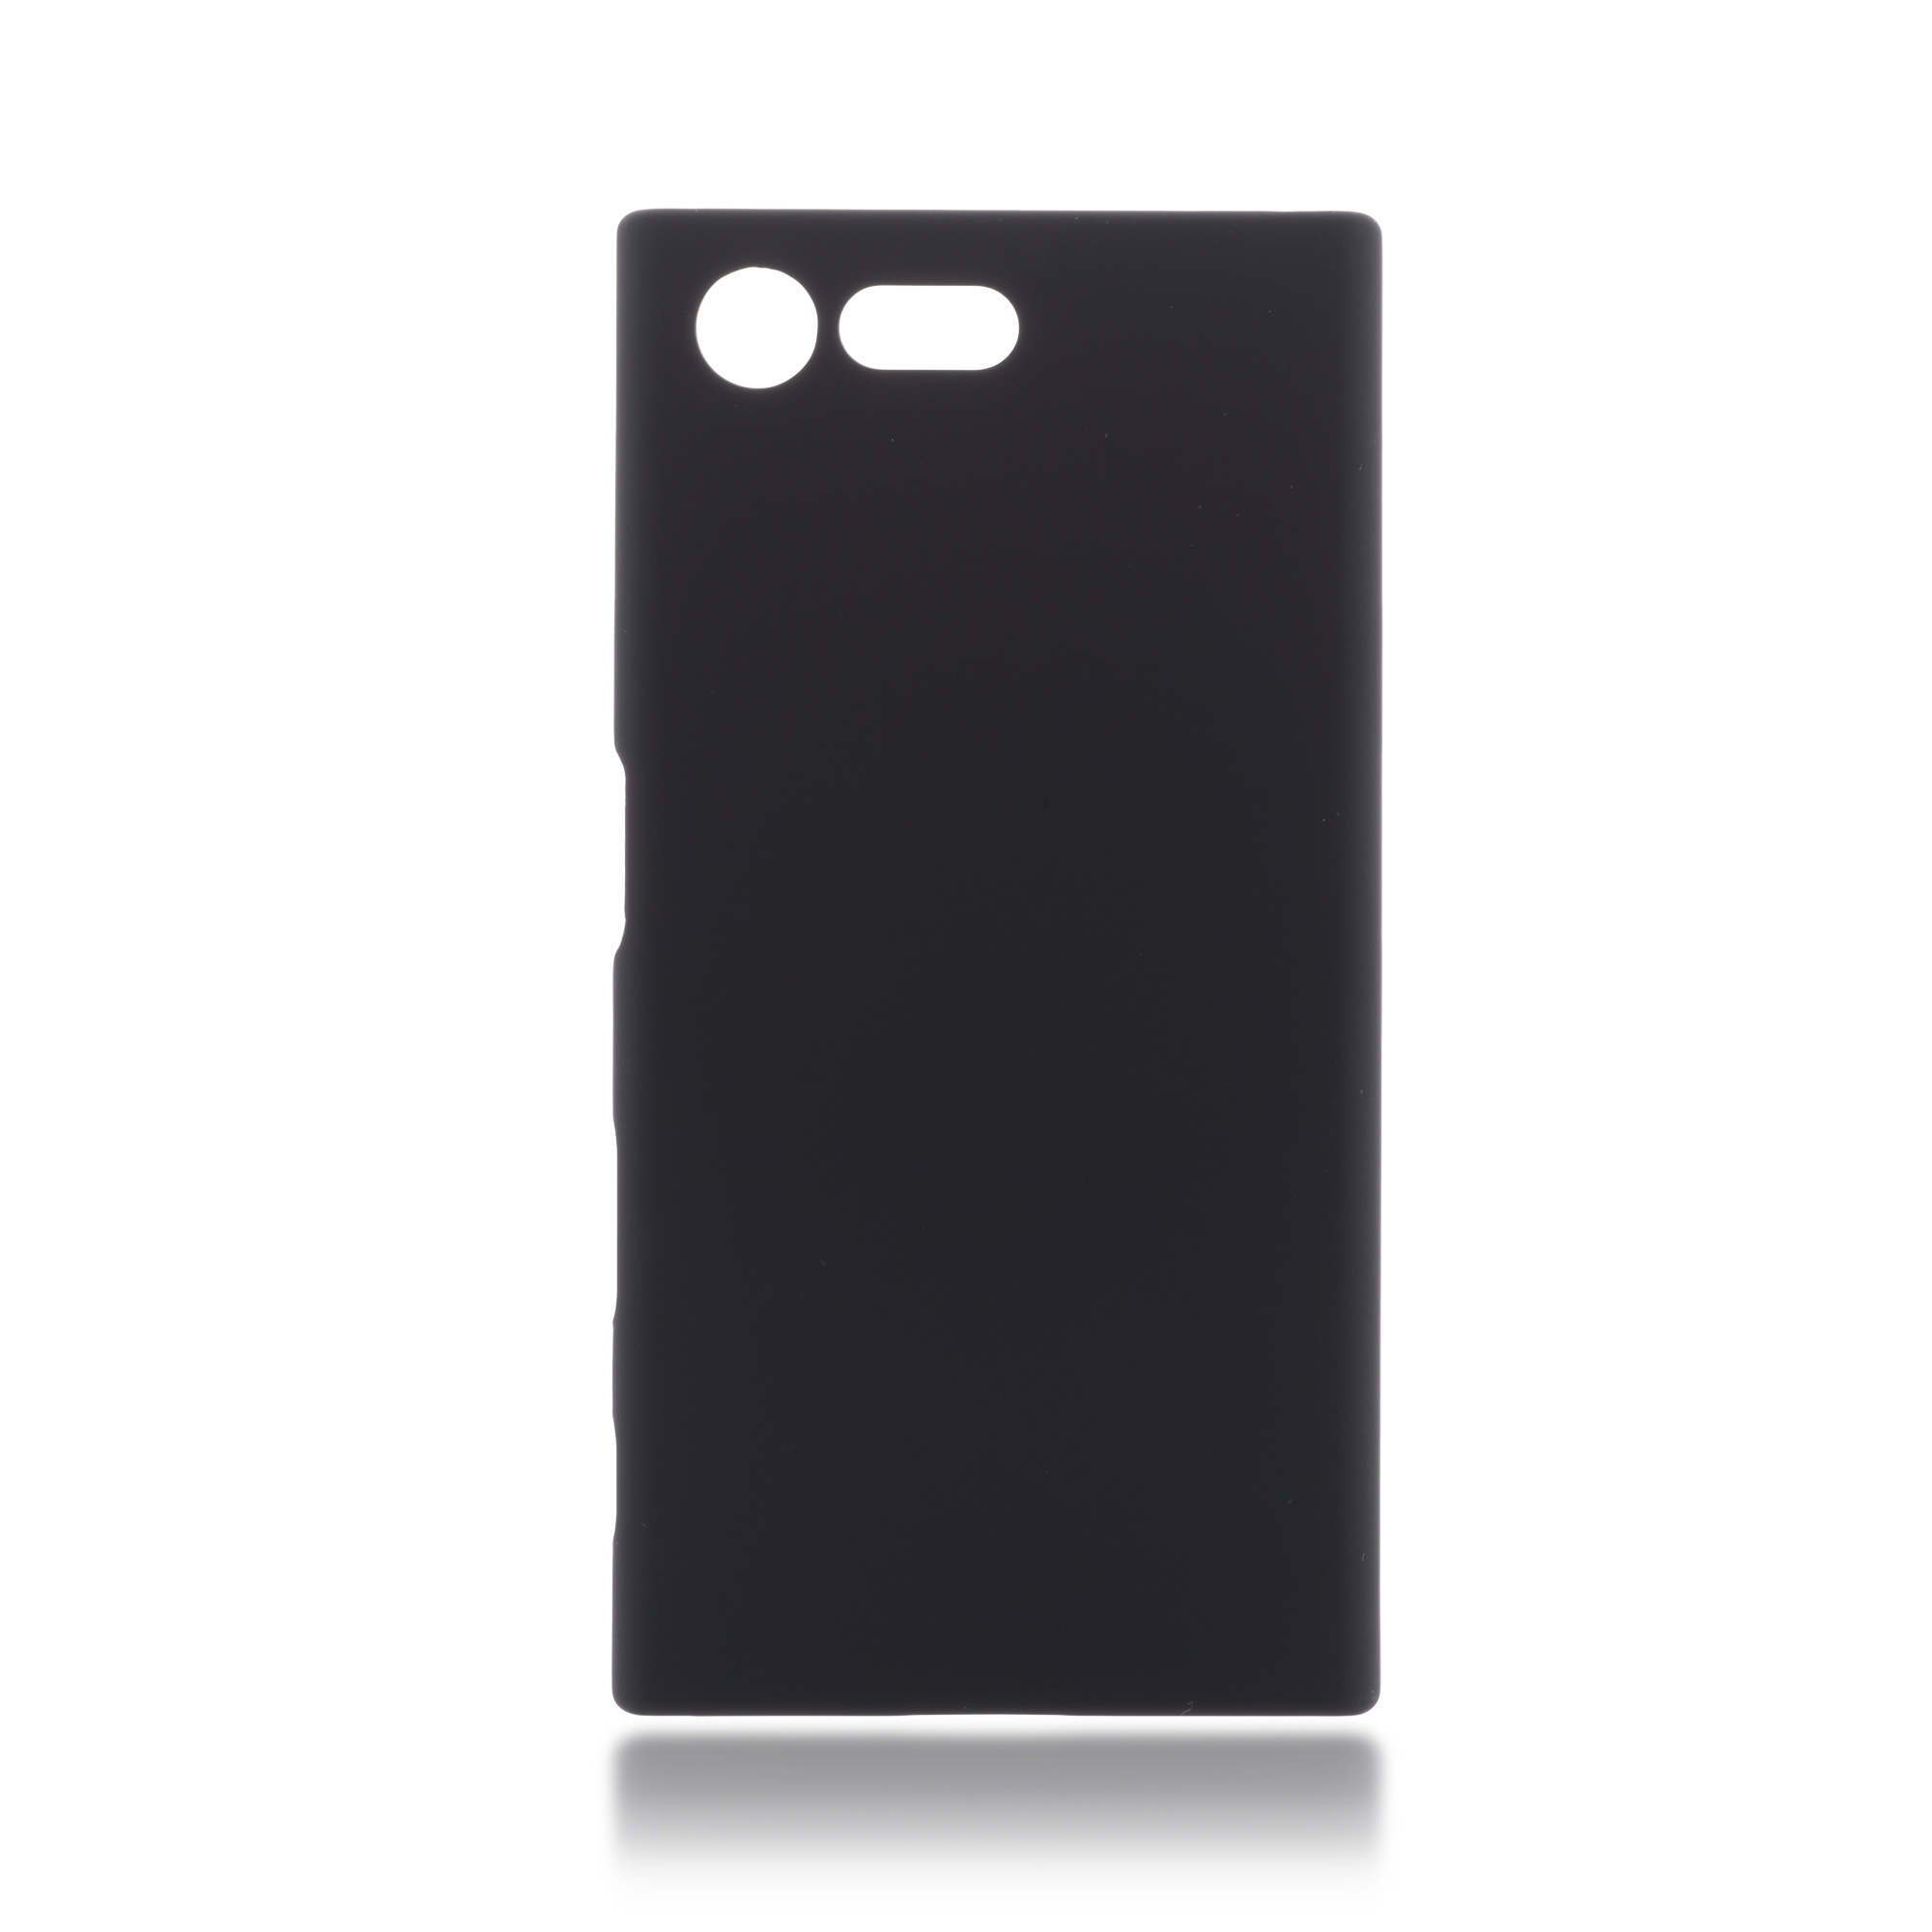 Пластиковая накладка Brosco Soft-touch для Sony Xperia X Compact, черная